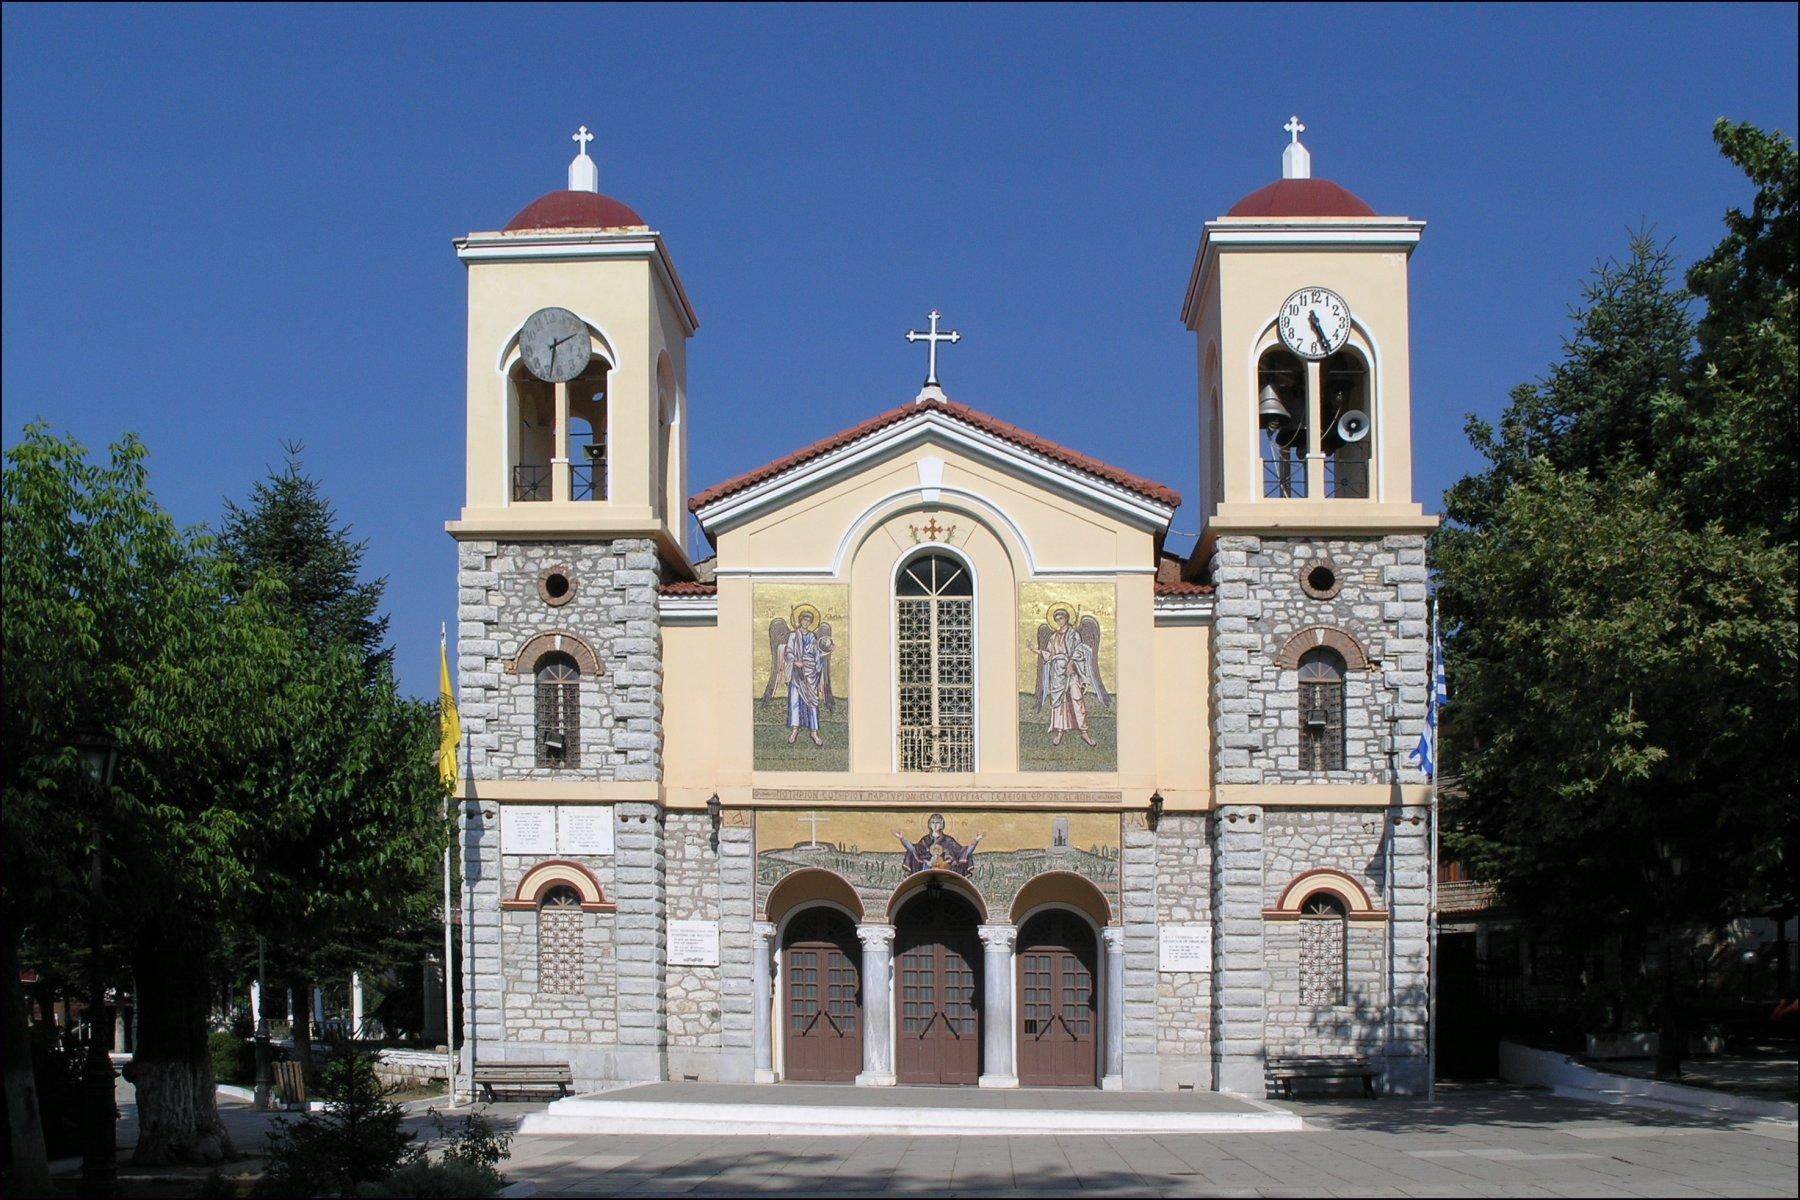 Catedrala Mitropolitana din Kalavrita a fost sparta